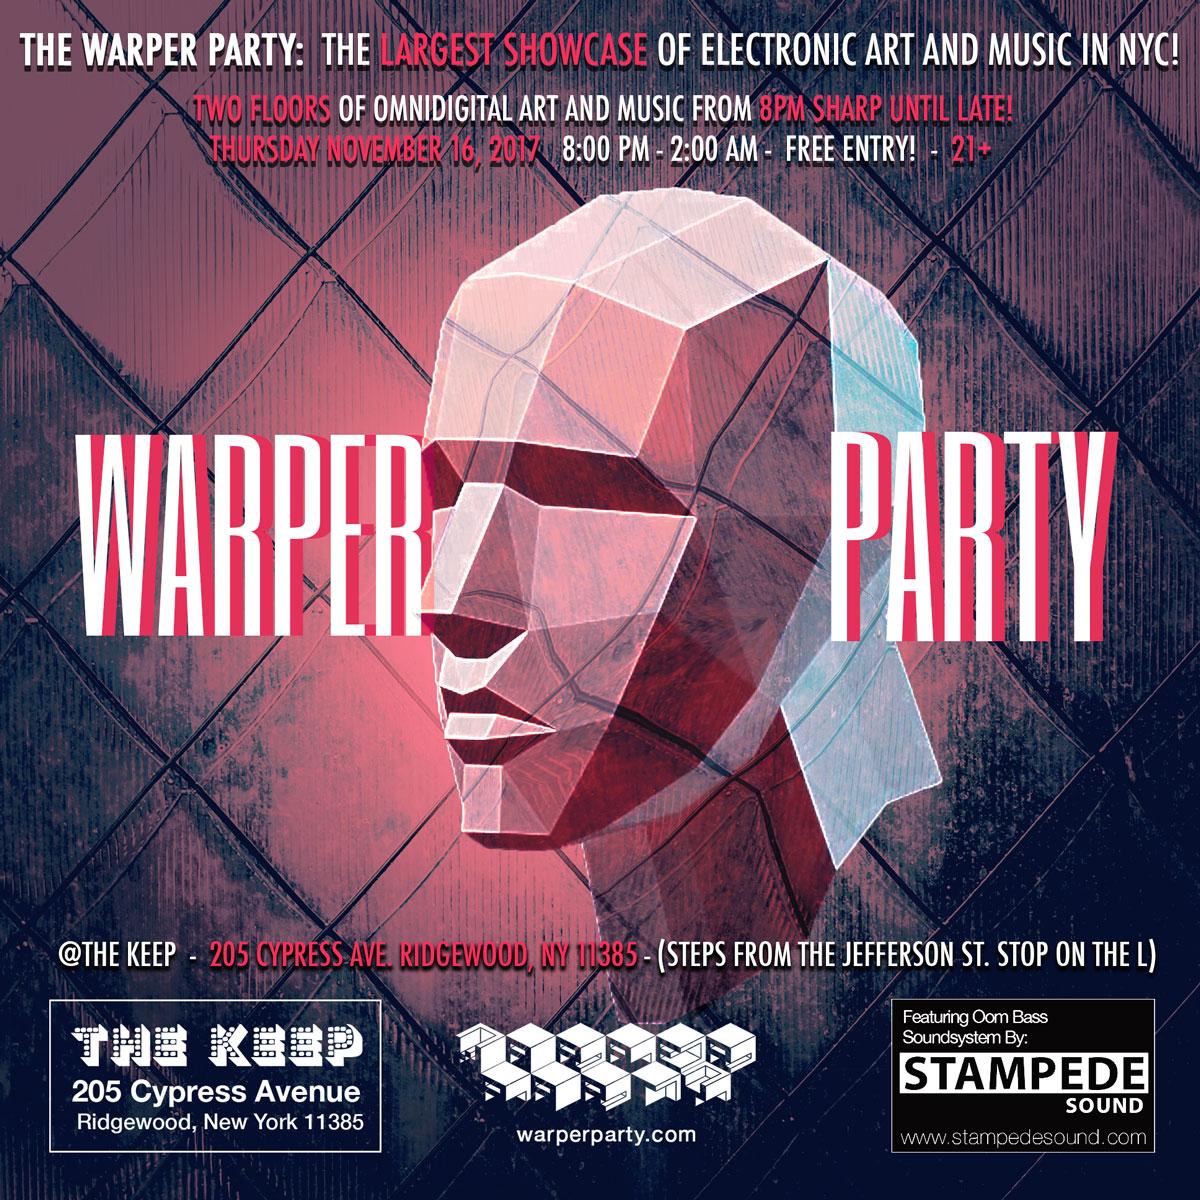 WARPER PARTY November 16, 2017: (Flyer design: Tom Myruski)